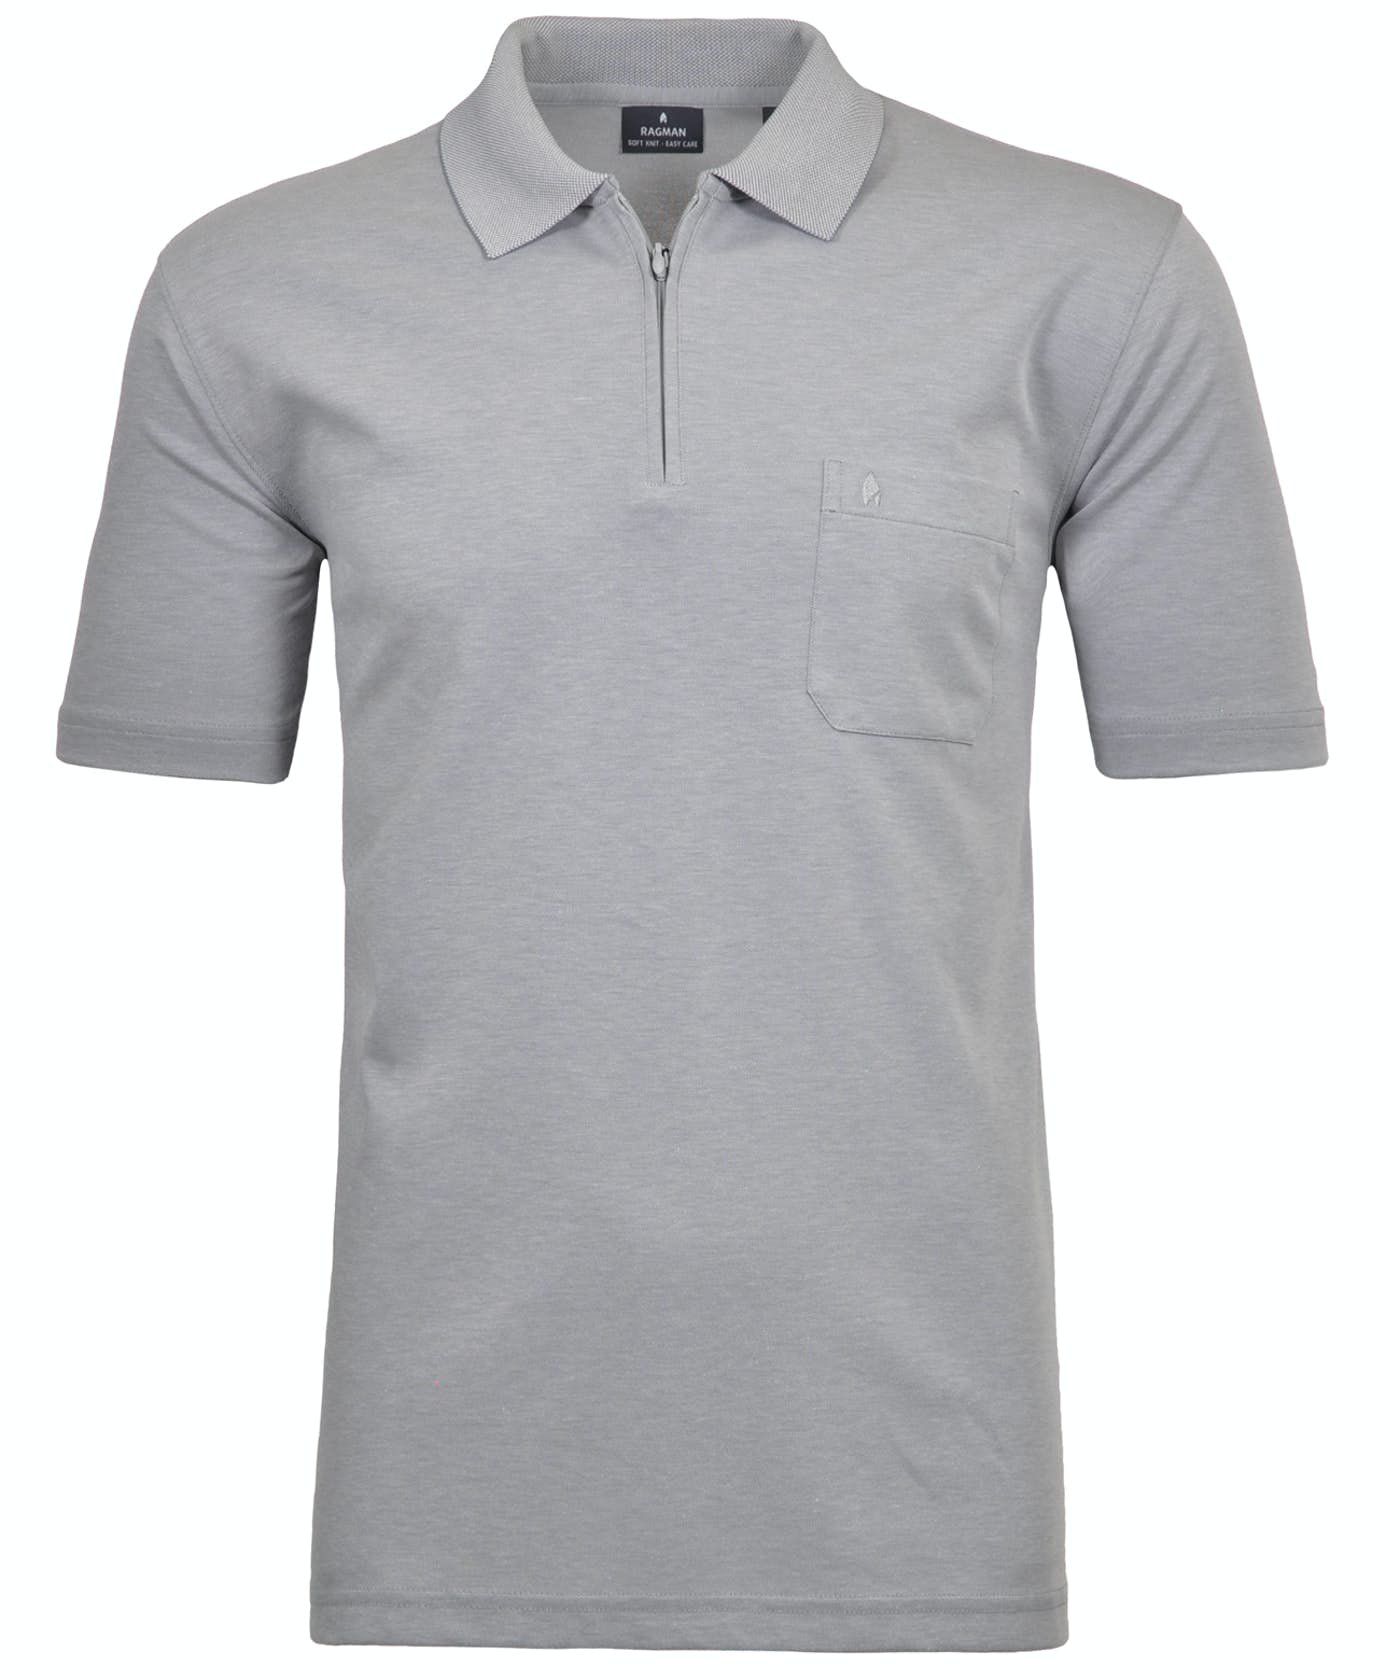 RAGMAN Kurzarm Poloshirt